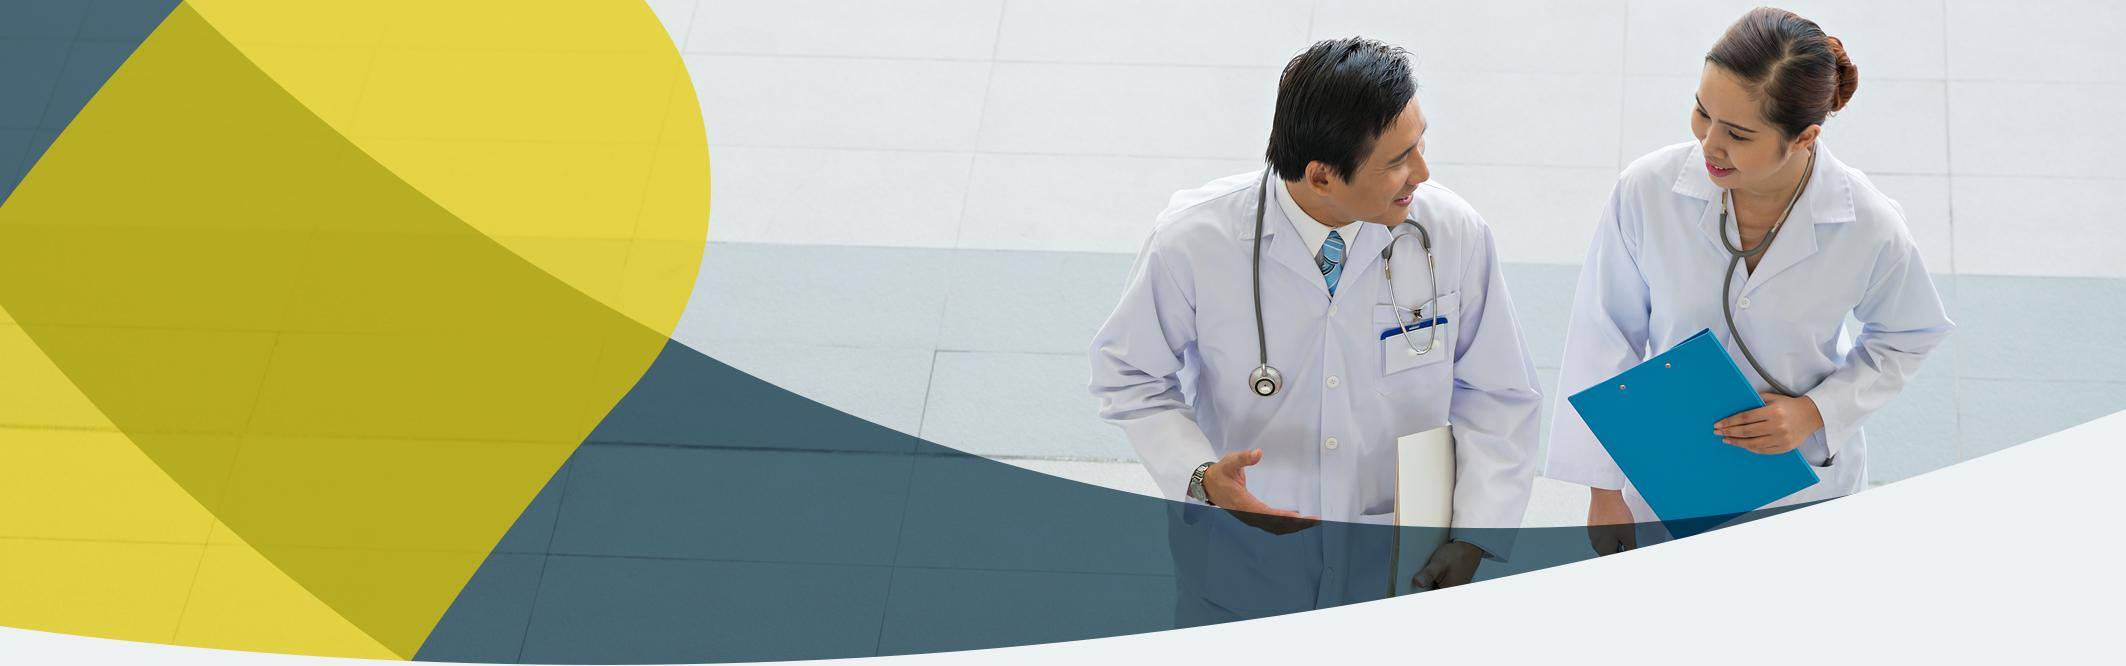 APT Prothesen - Mit Ärzten & Therapeuten als Partner